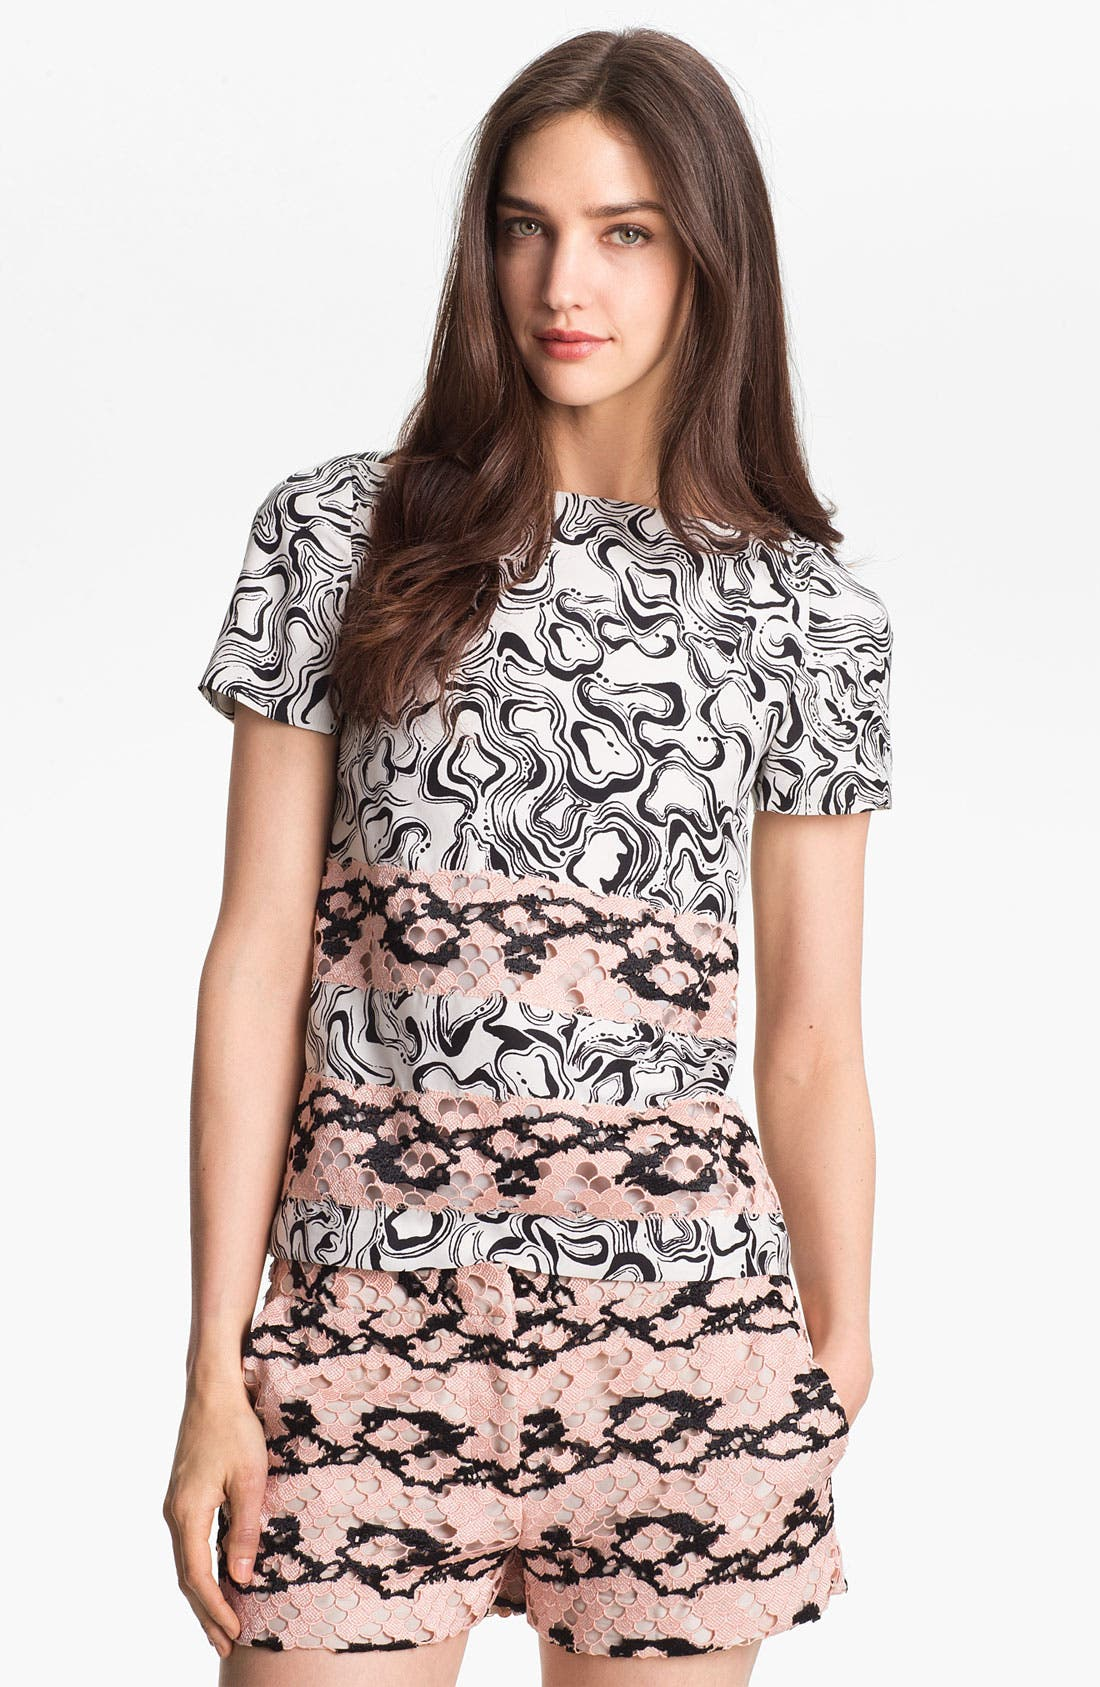 Alternate Image 1 Selected - Diane von Furstenberg 'Blossom' Silk Tee